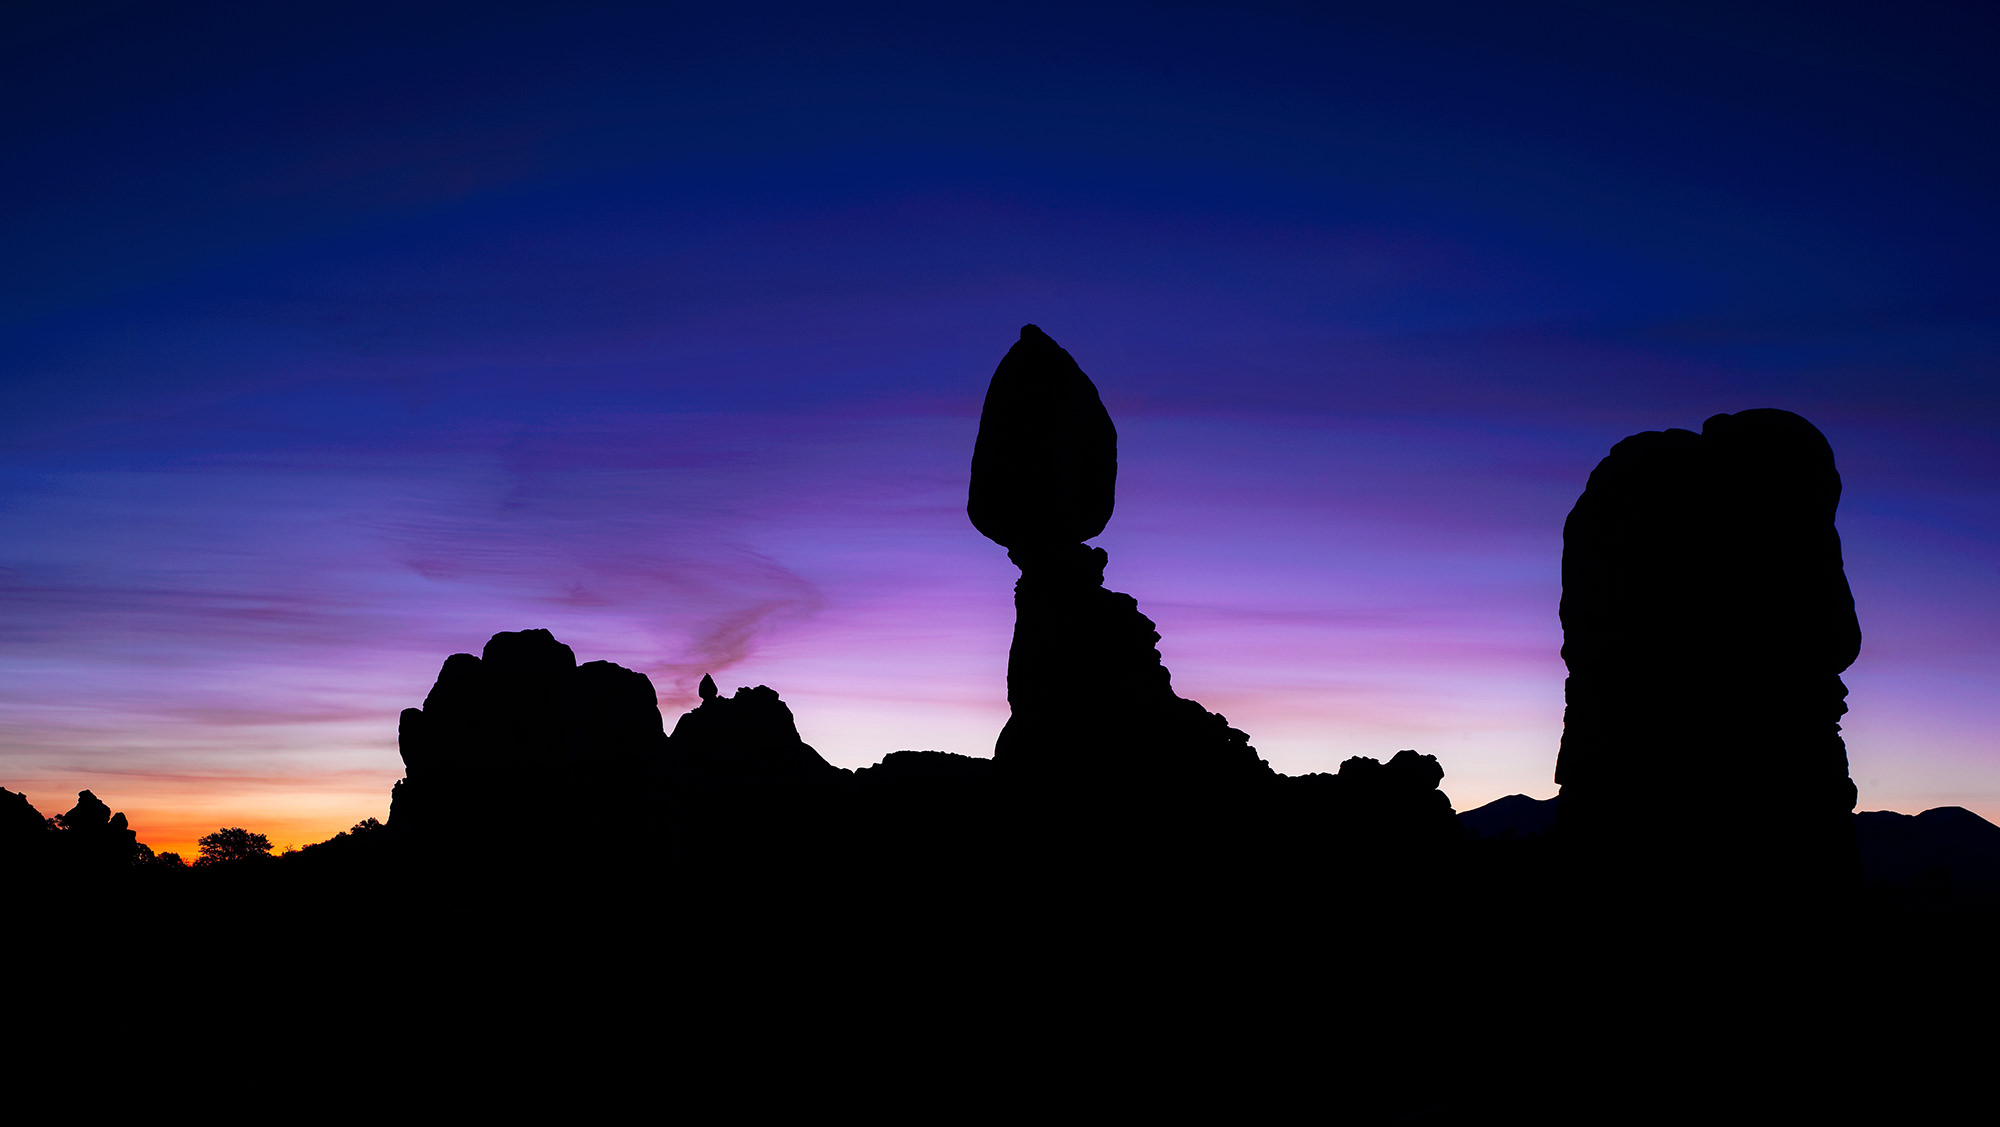 Balanced Rock - Arches National Park, UT